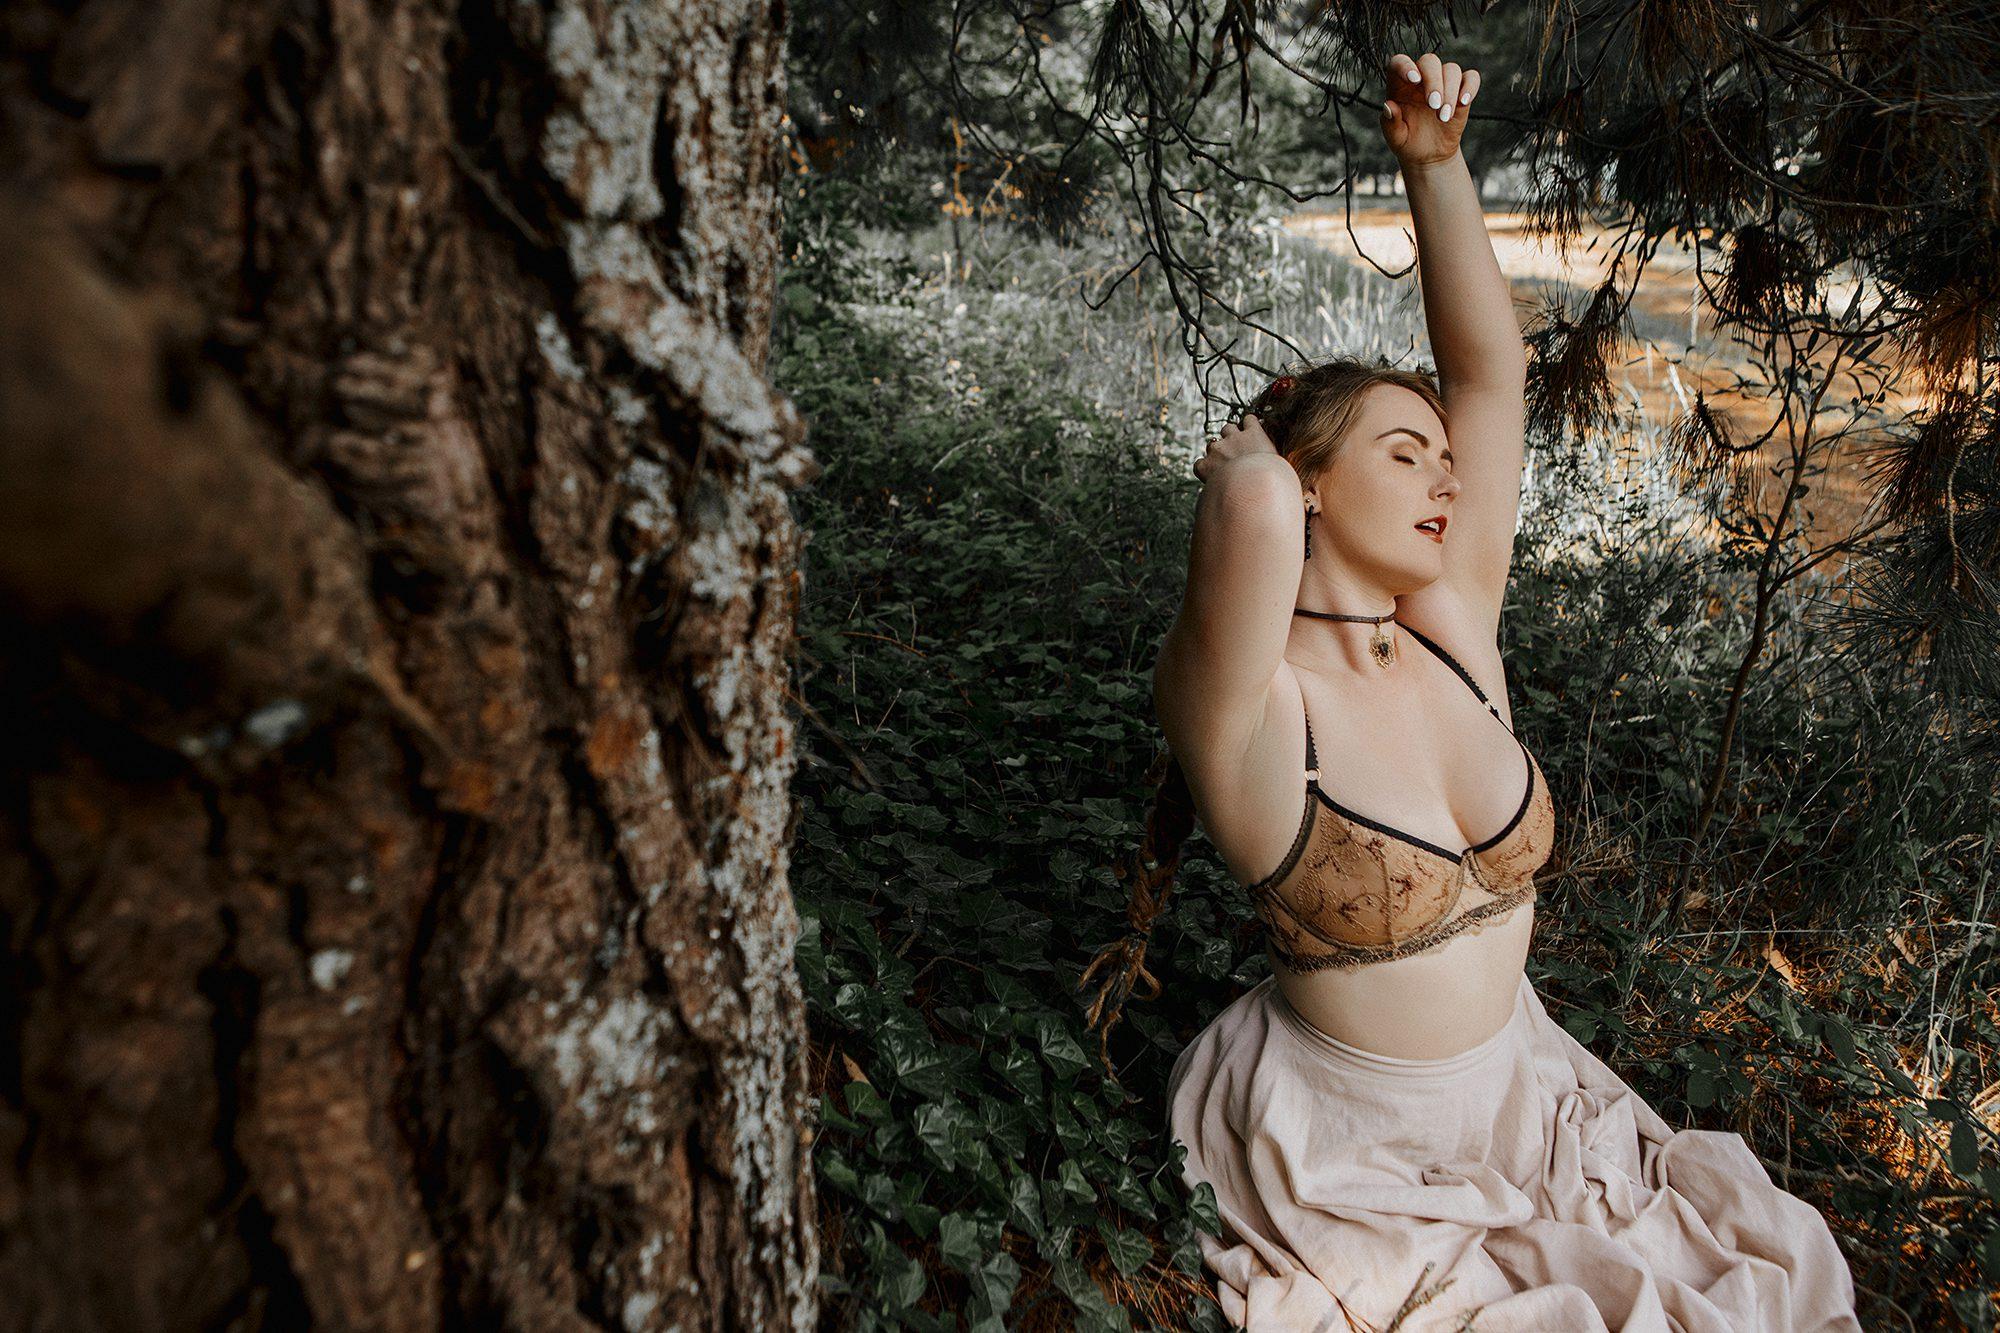 Melbourne Escort Isla Fae TheLovelyIsla Companion Sex Worker Australian Escort